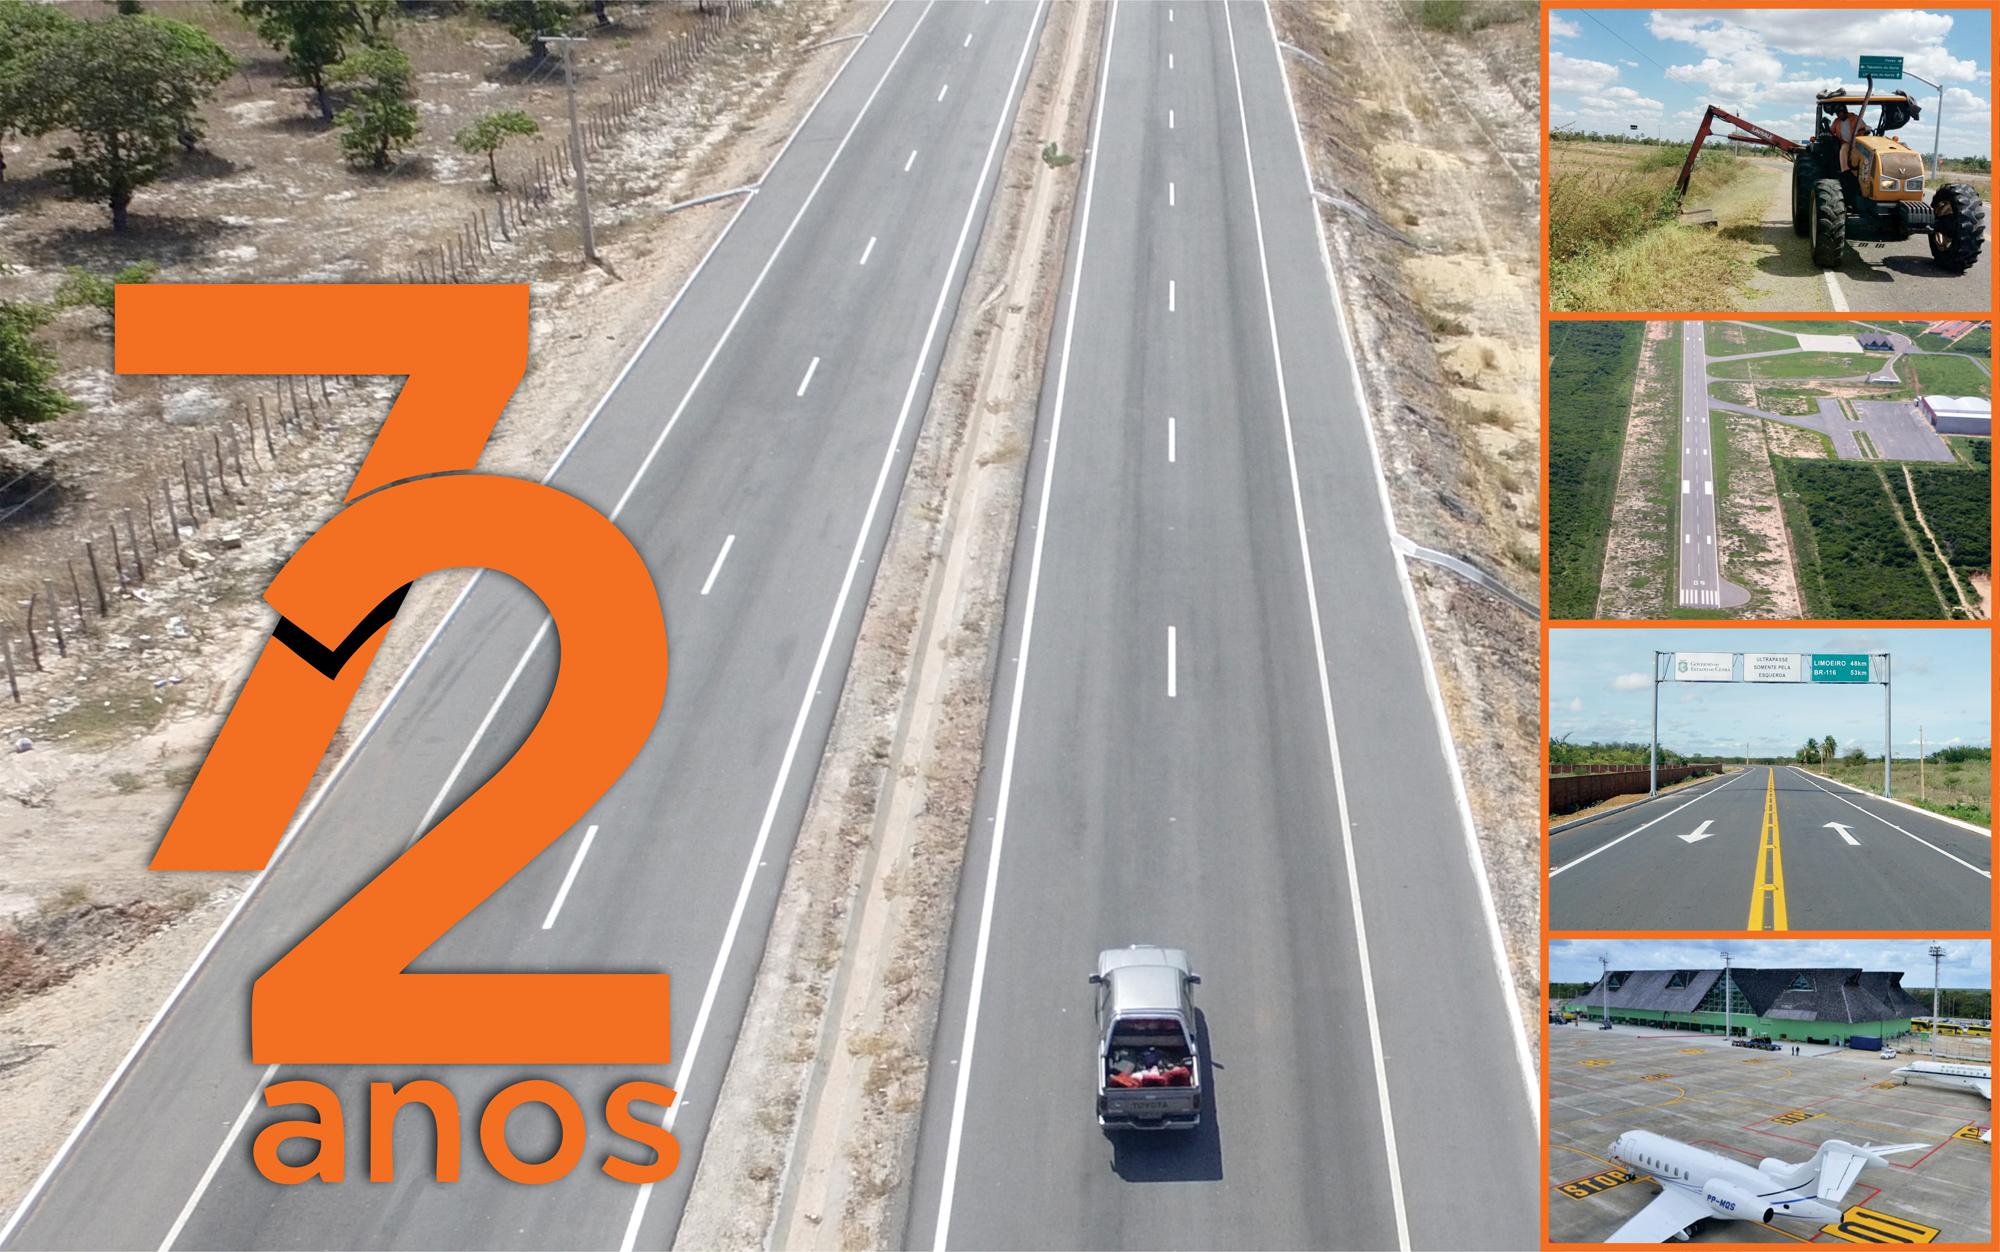 Departamento Estadual de Rodovias completa 72 anos